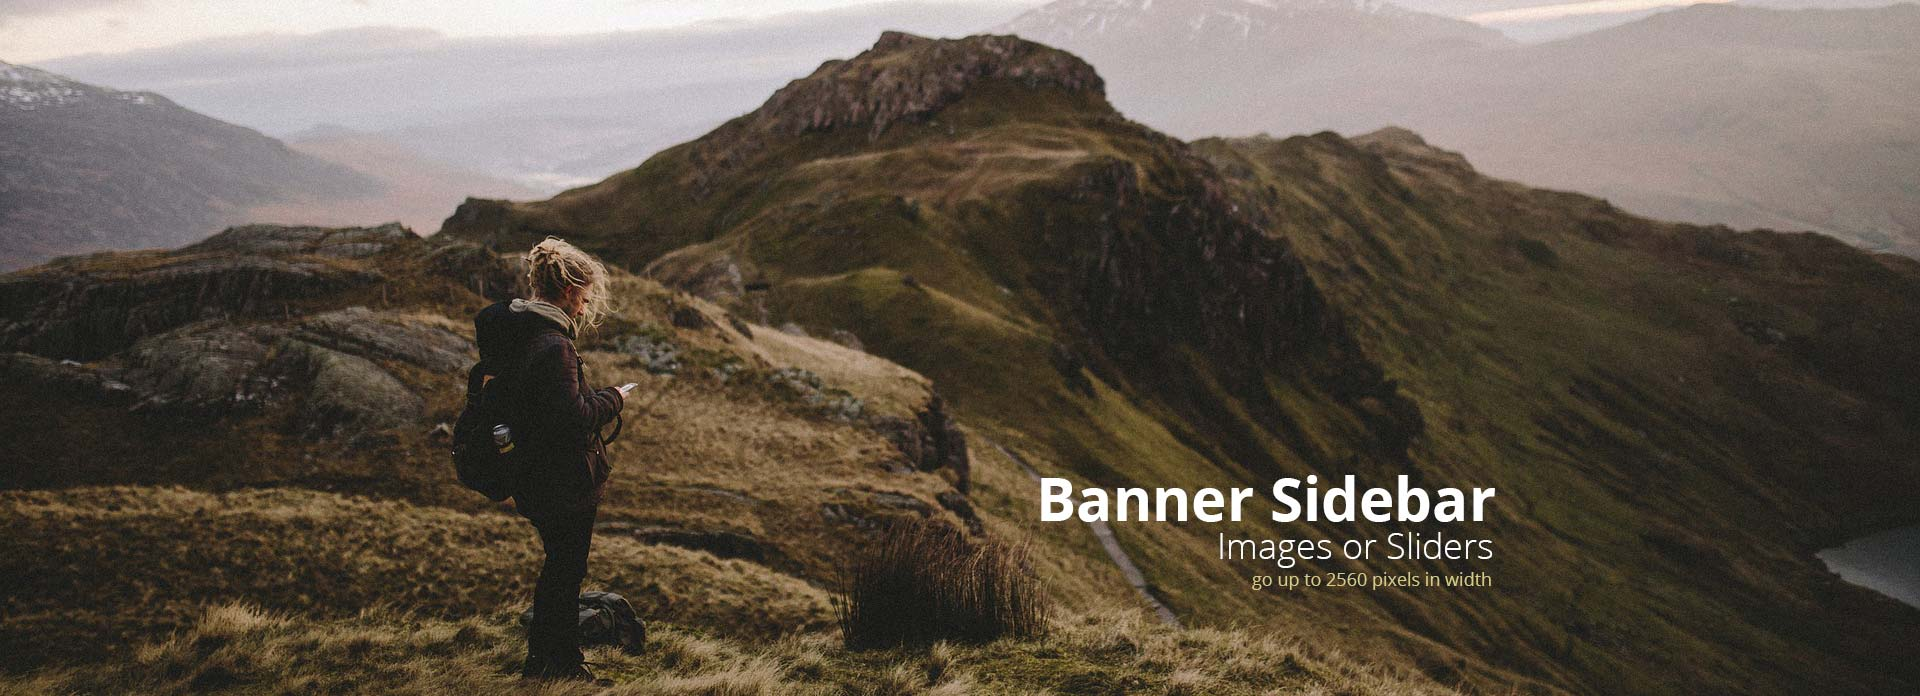 banner sidebar